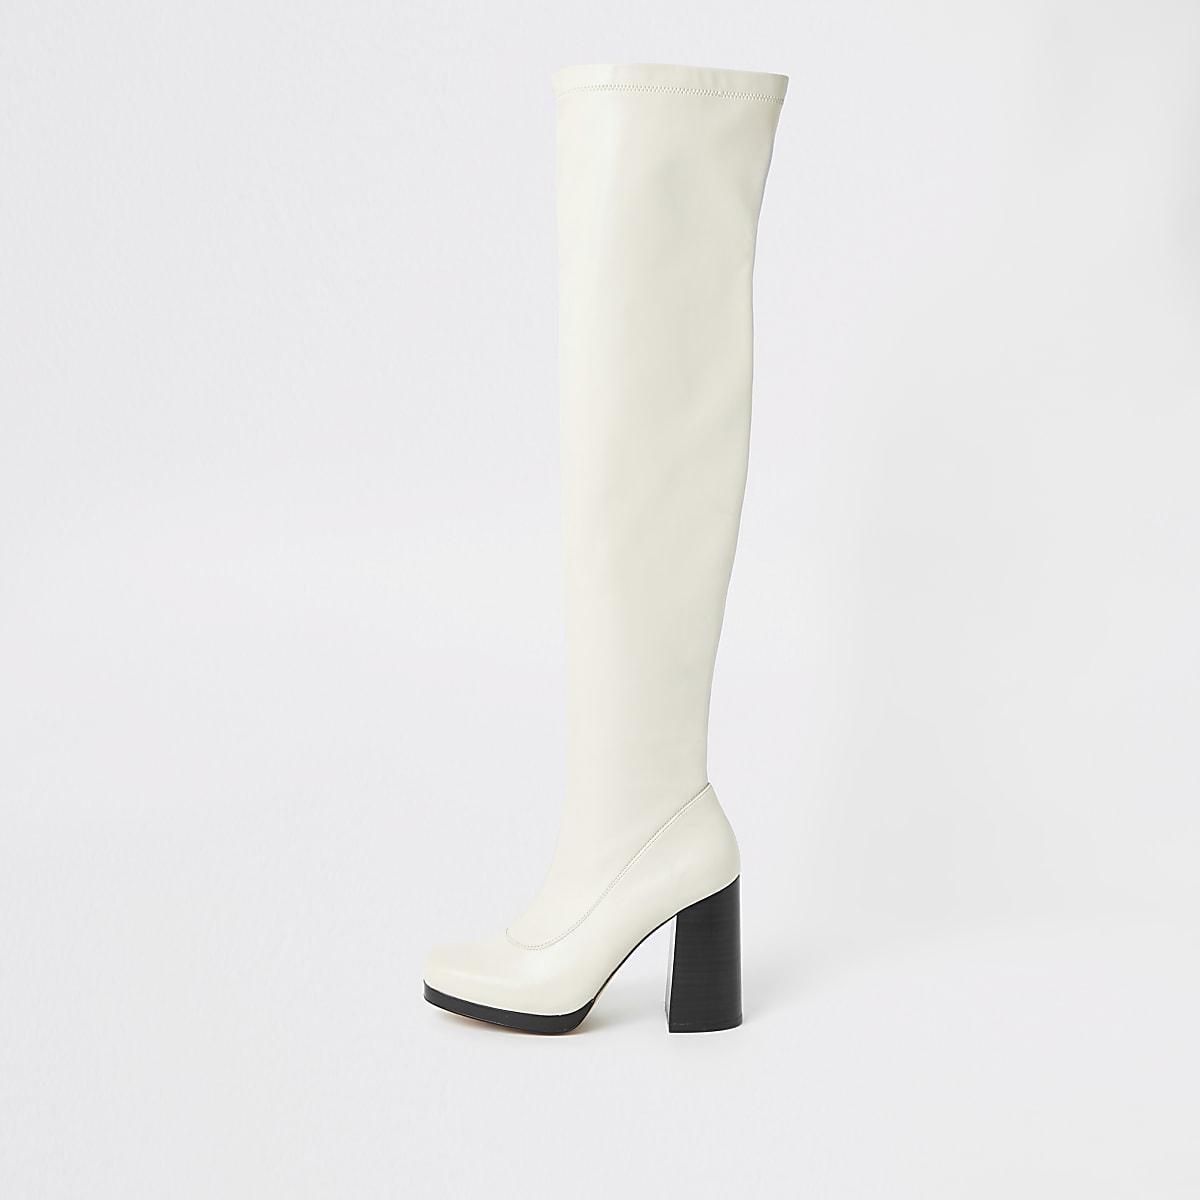 Witte over-de-knie laarzen met plateauzool